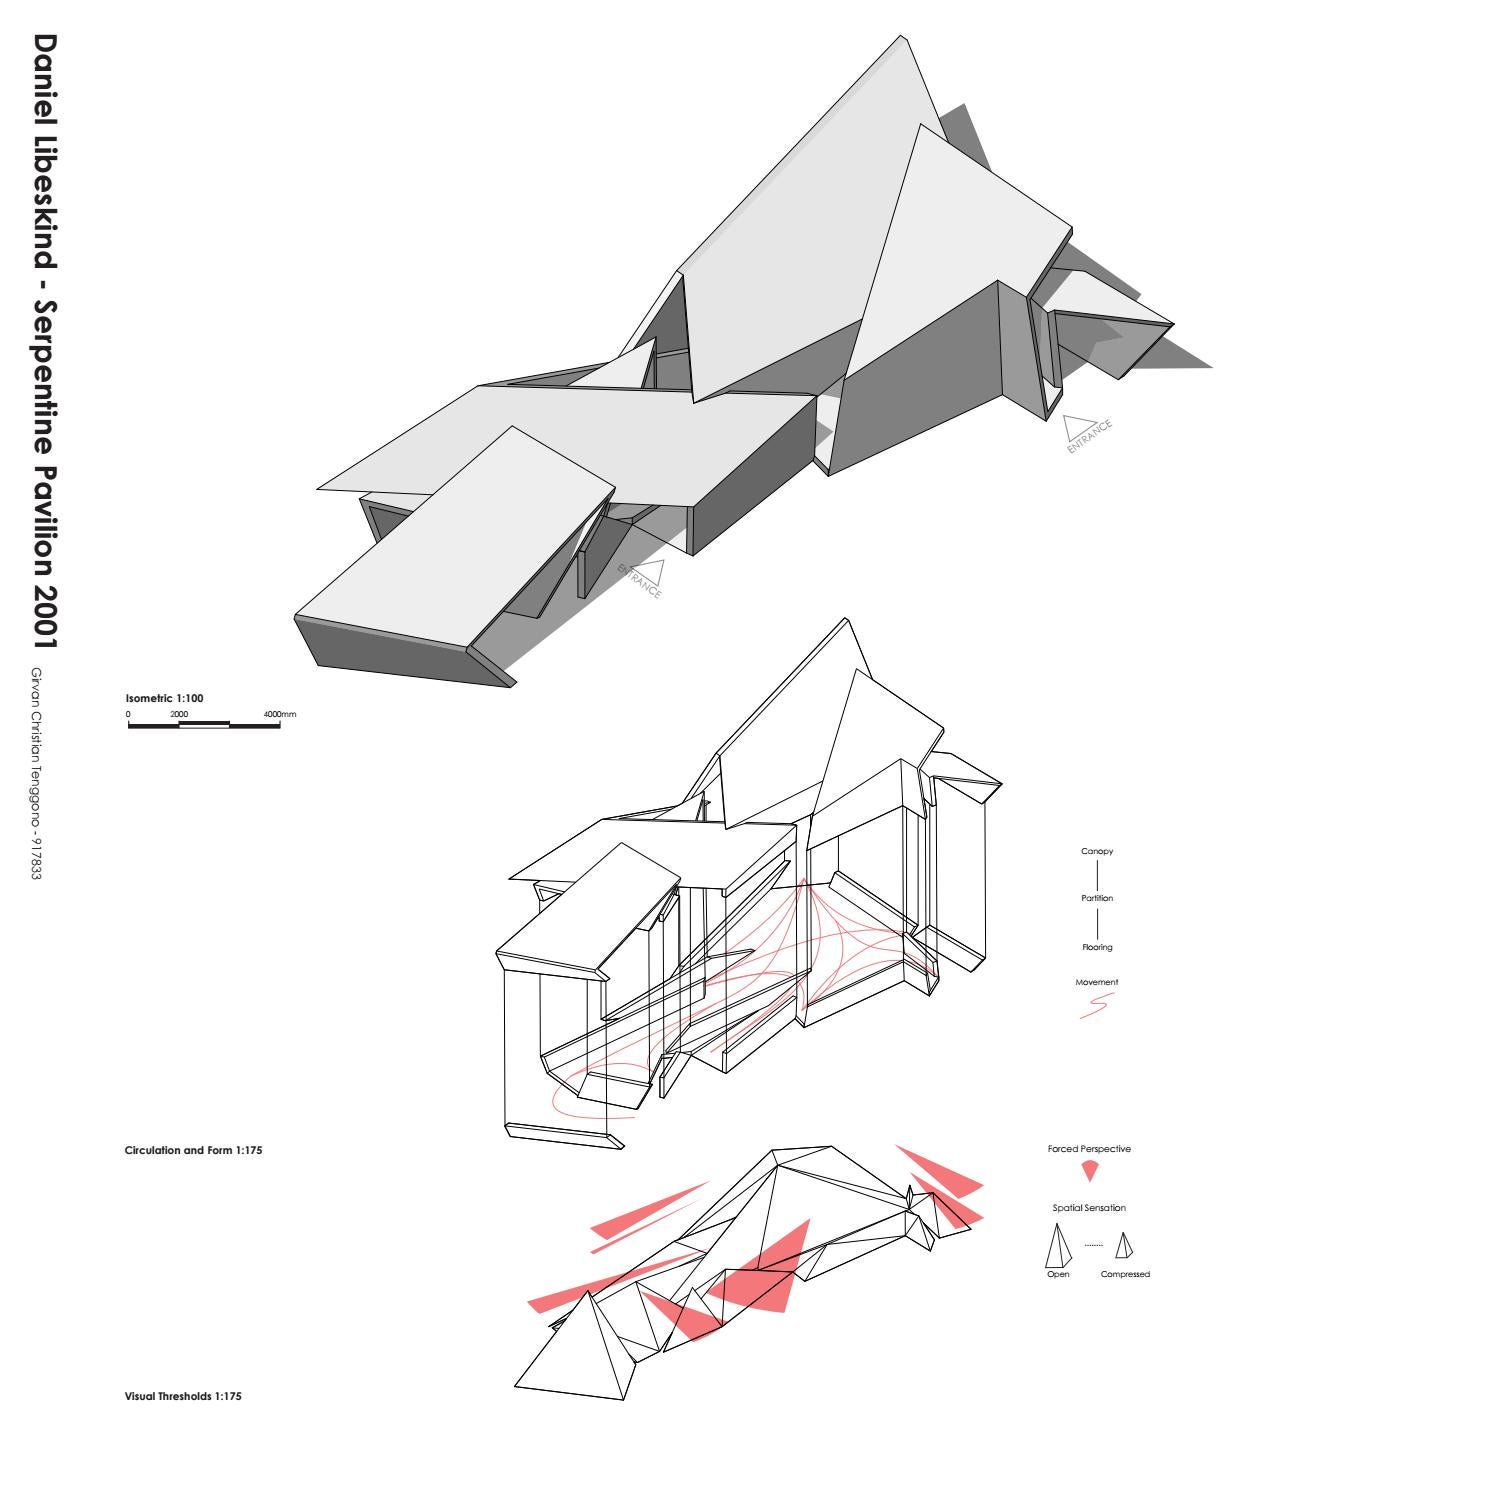 arch20004 digital design module 1 pin-up board by girvan christian tenggono